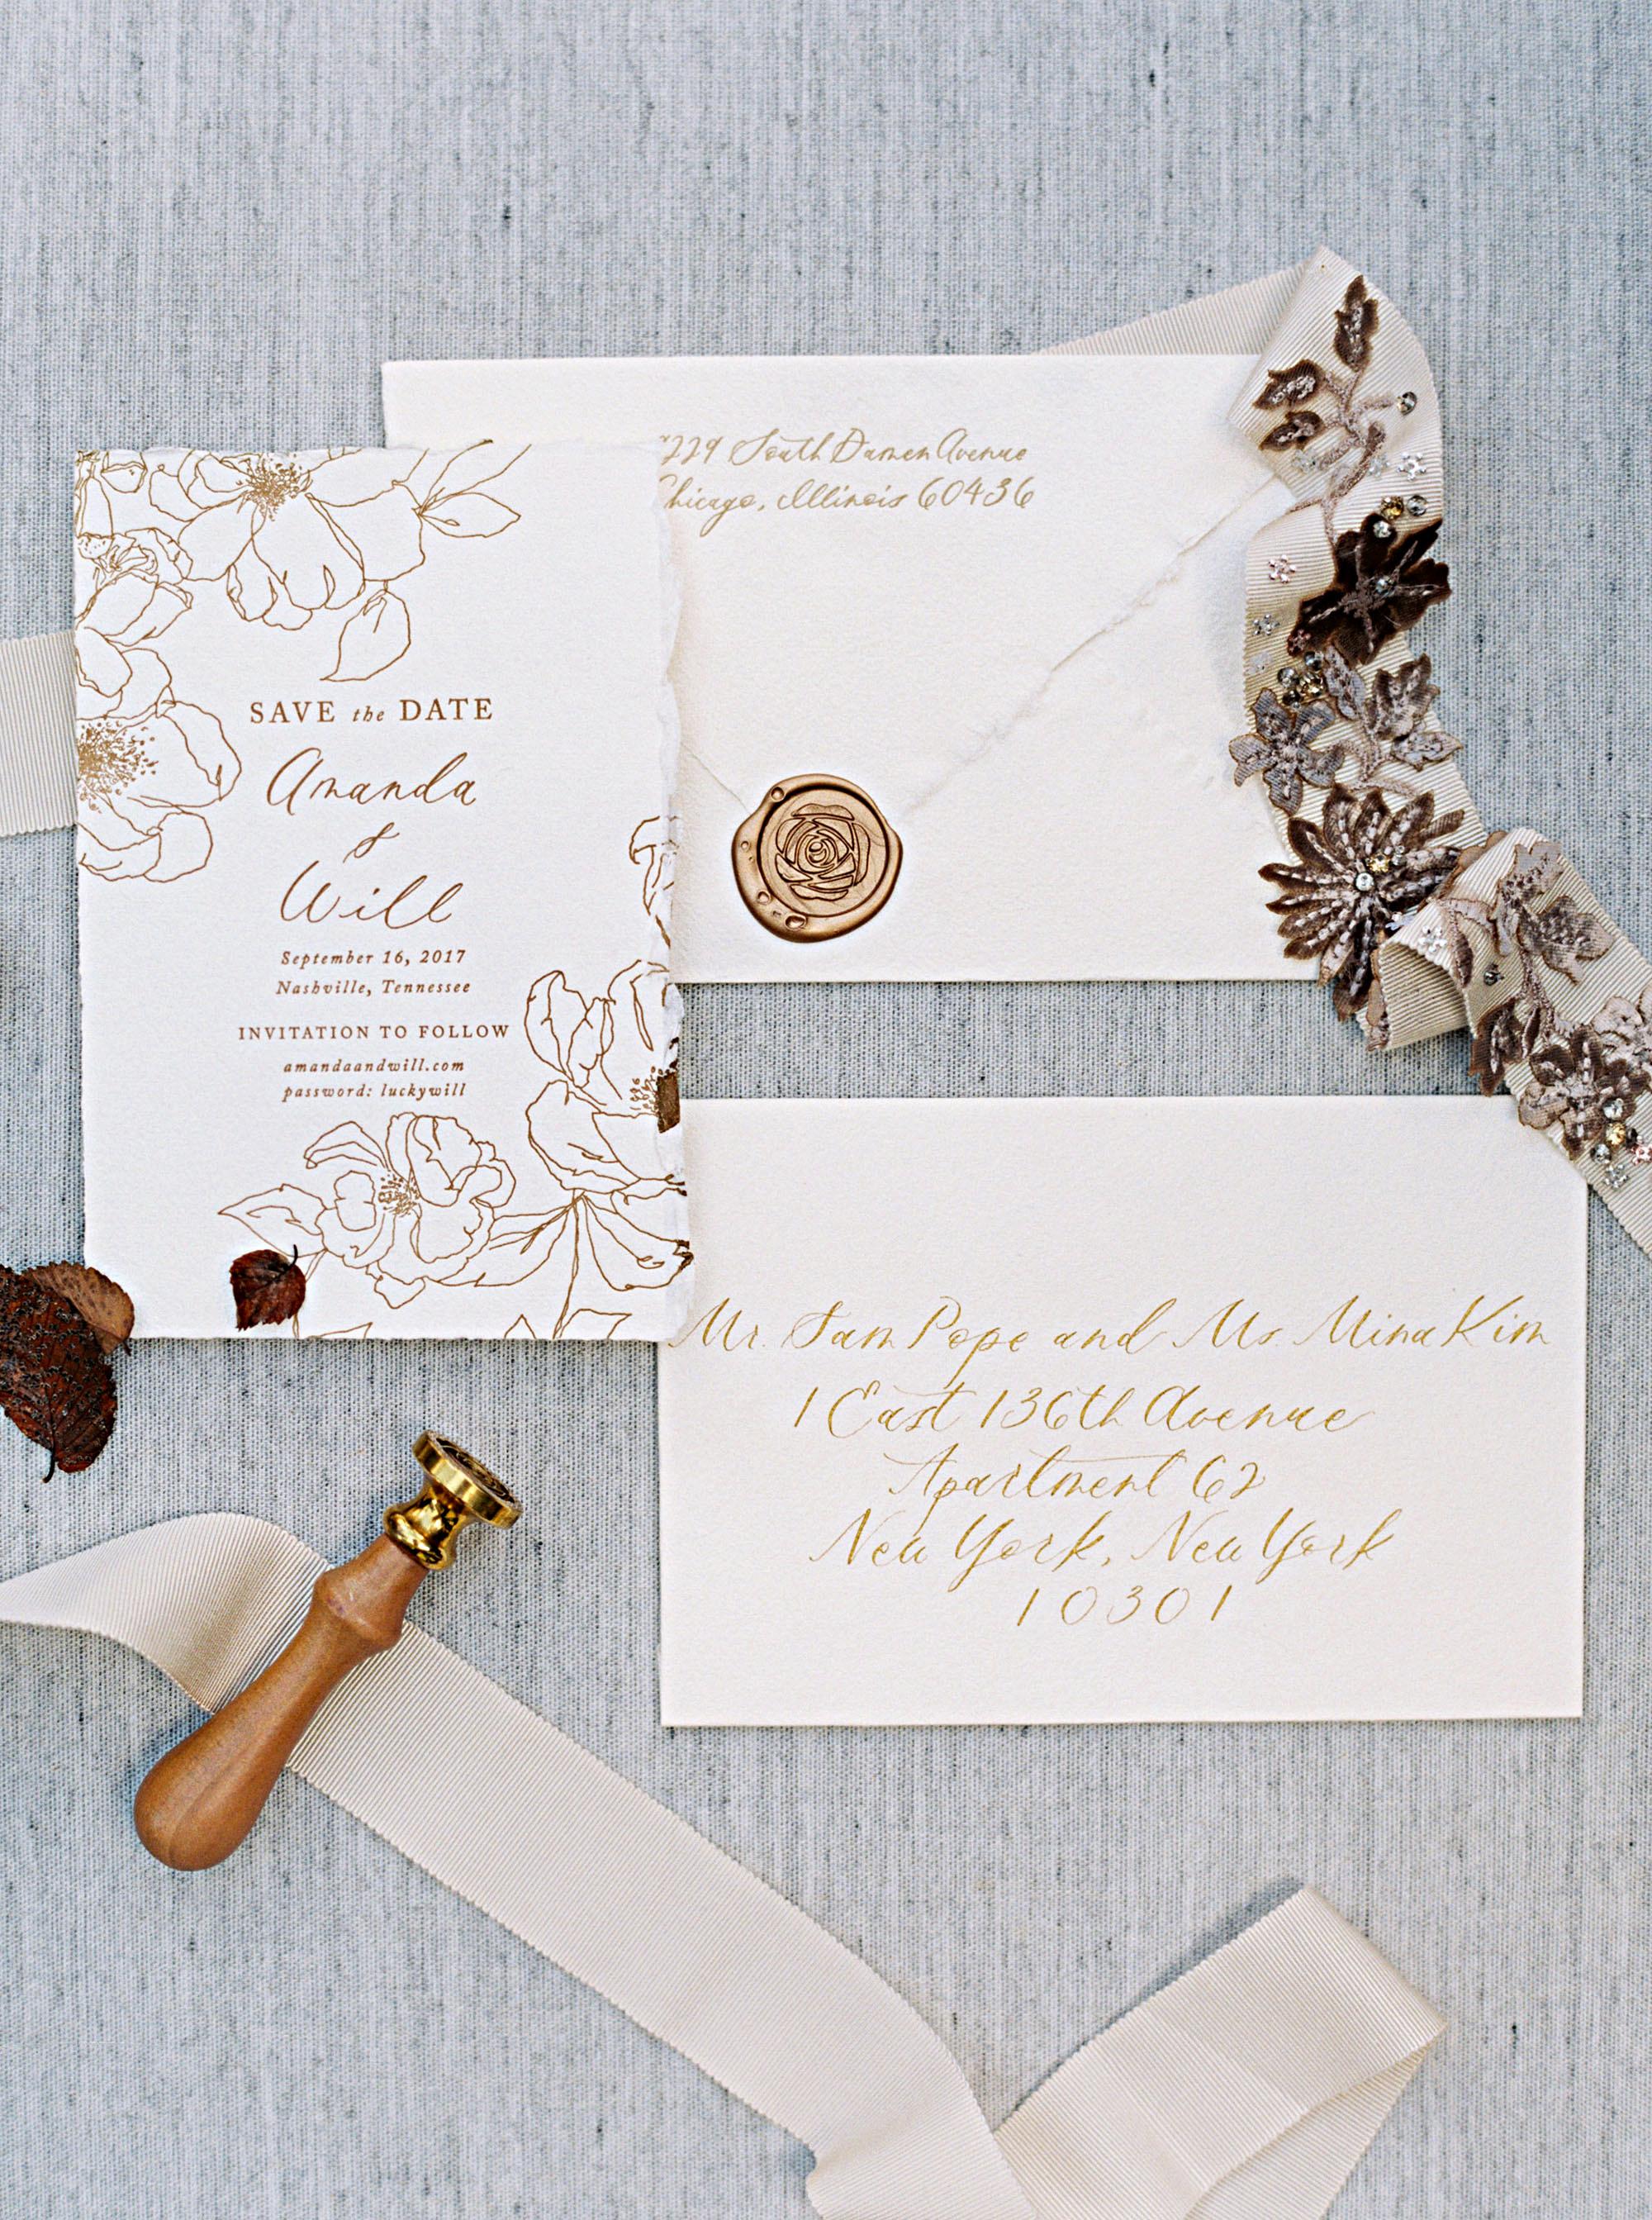 amanda william wedding tennessee save the date